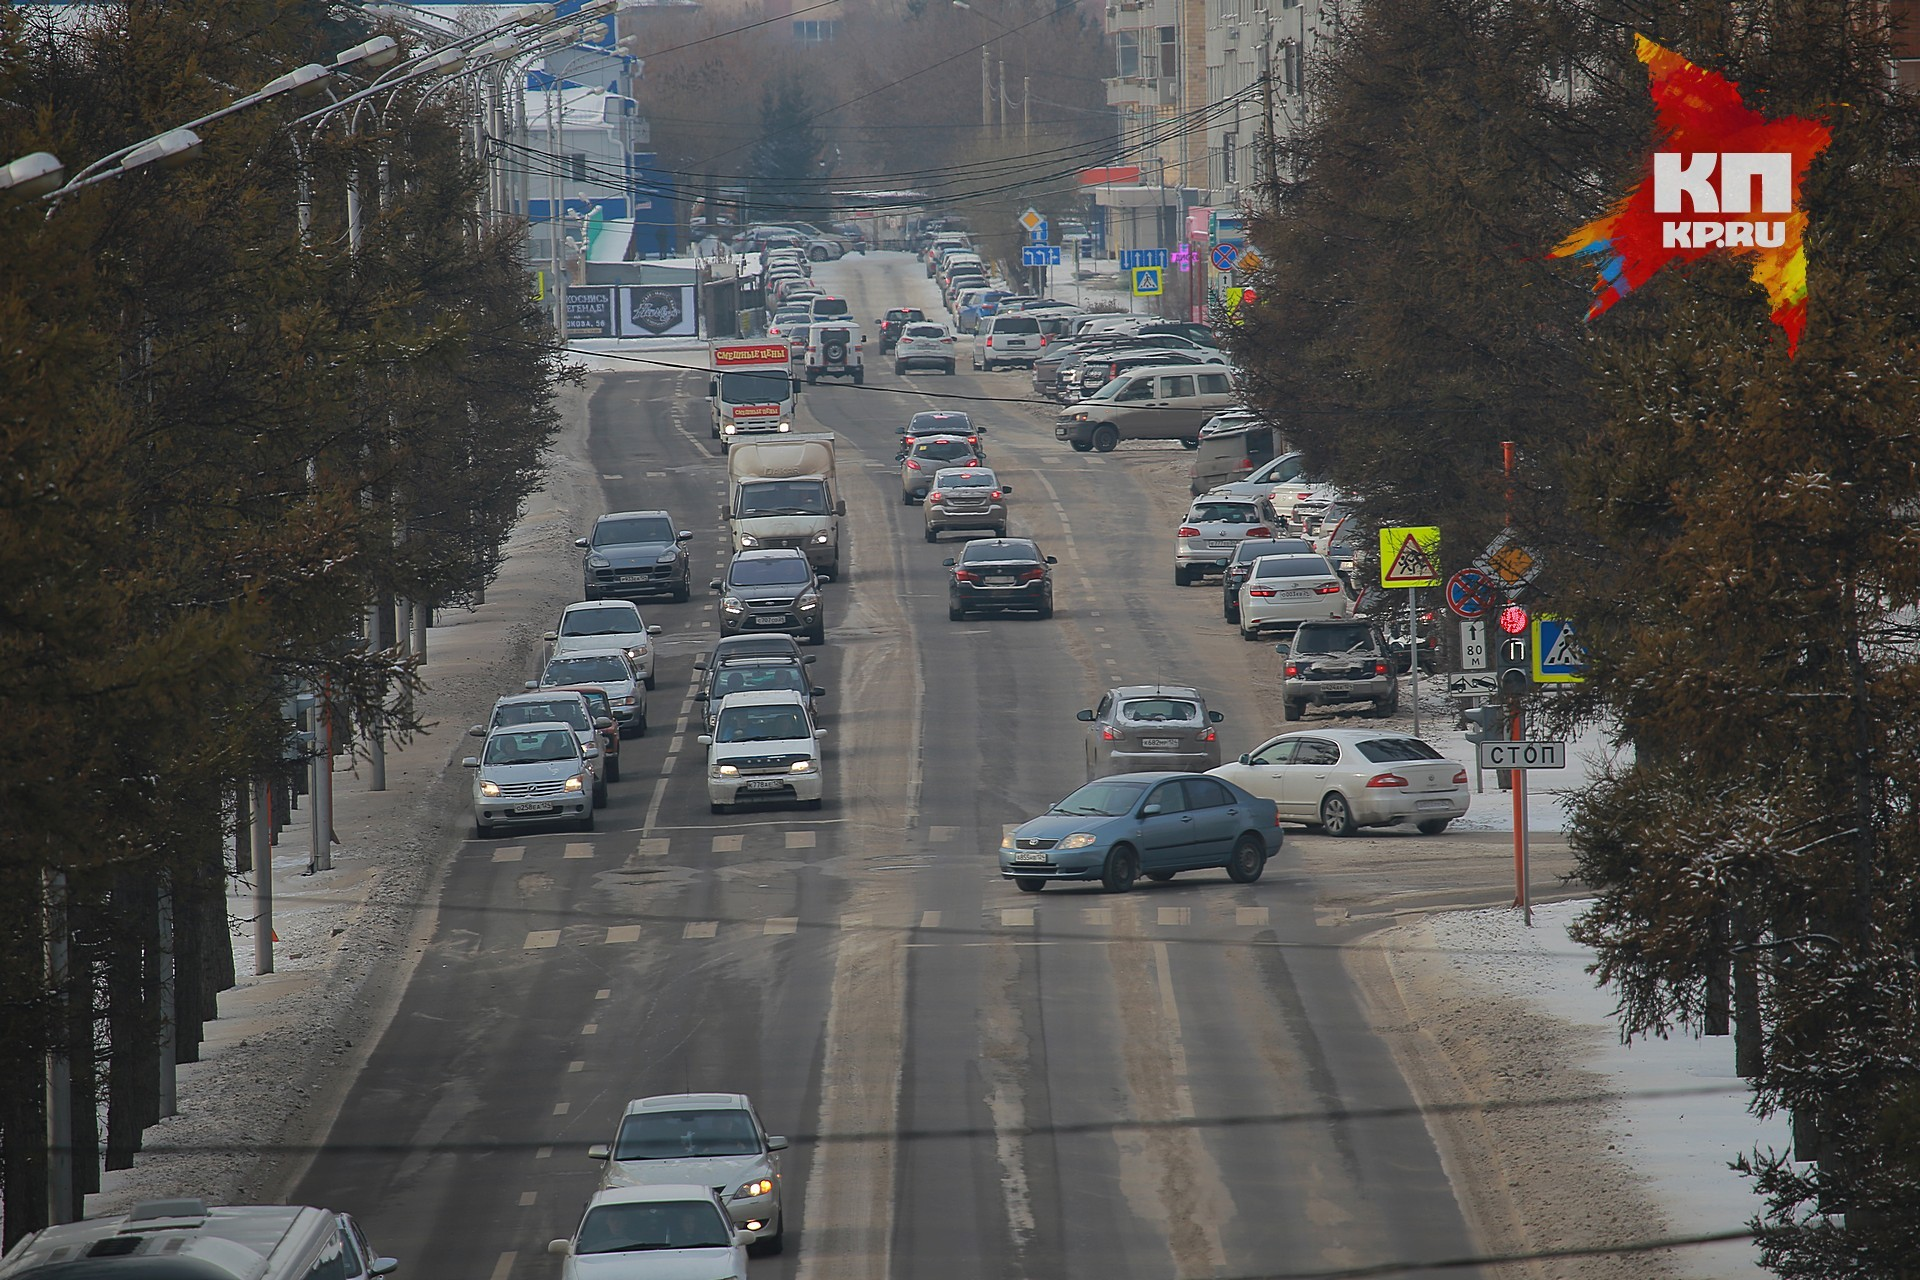 ВКрасноярске наремонт дорог в 2017г истратят 2 млрд руб.